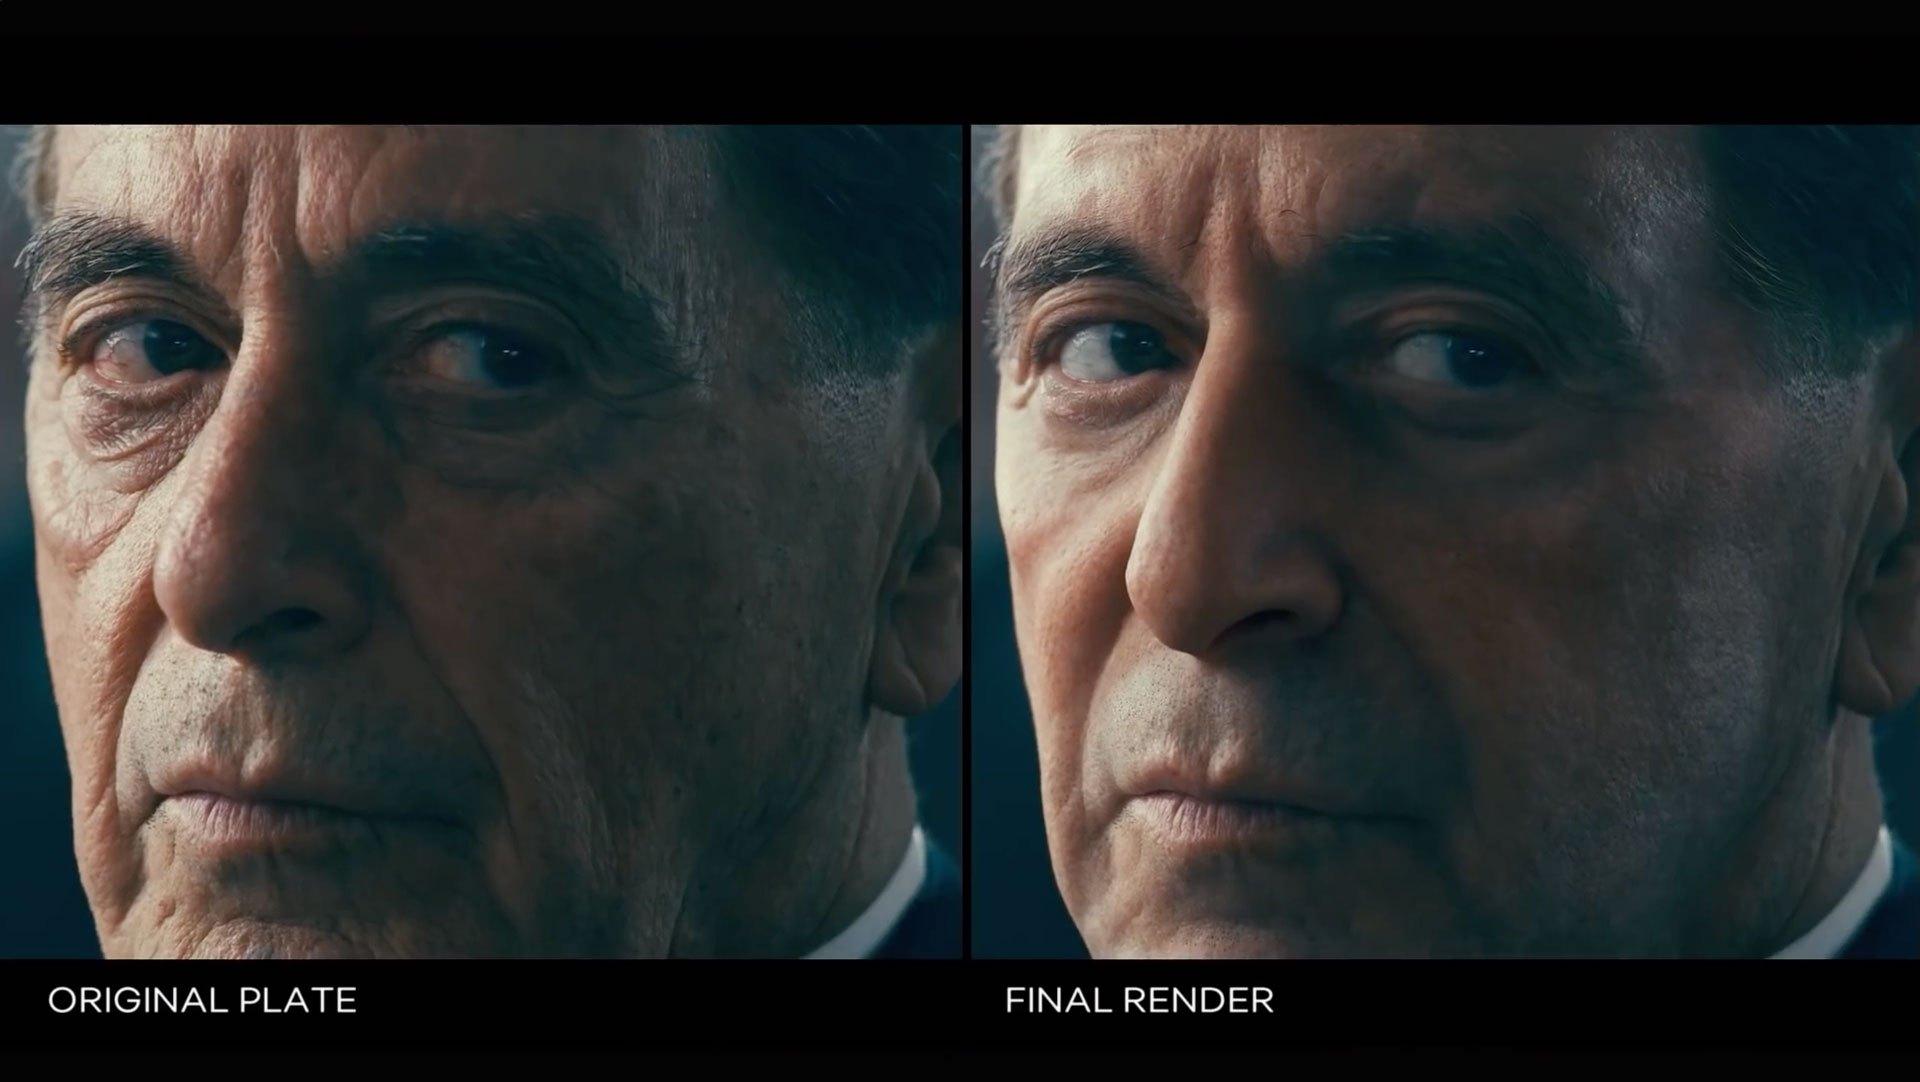 Video Editing, Color Correction, VFX